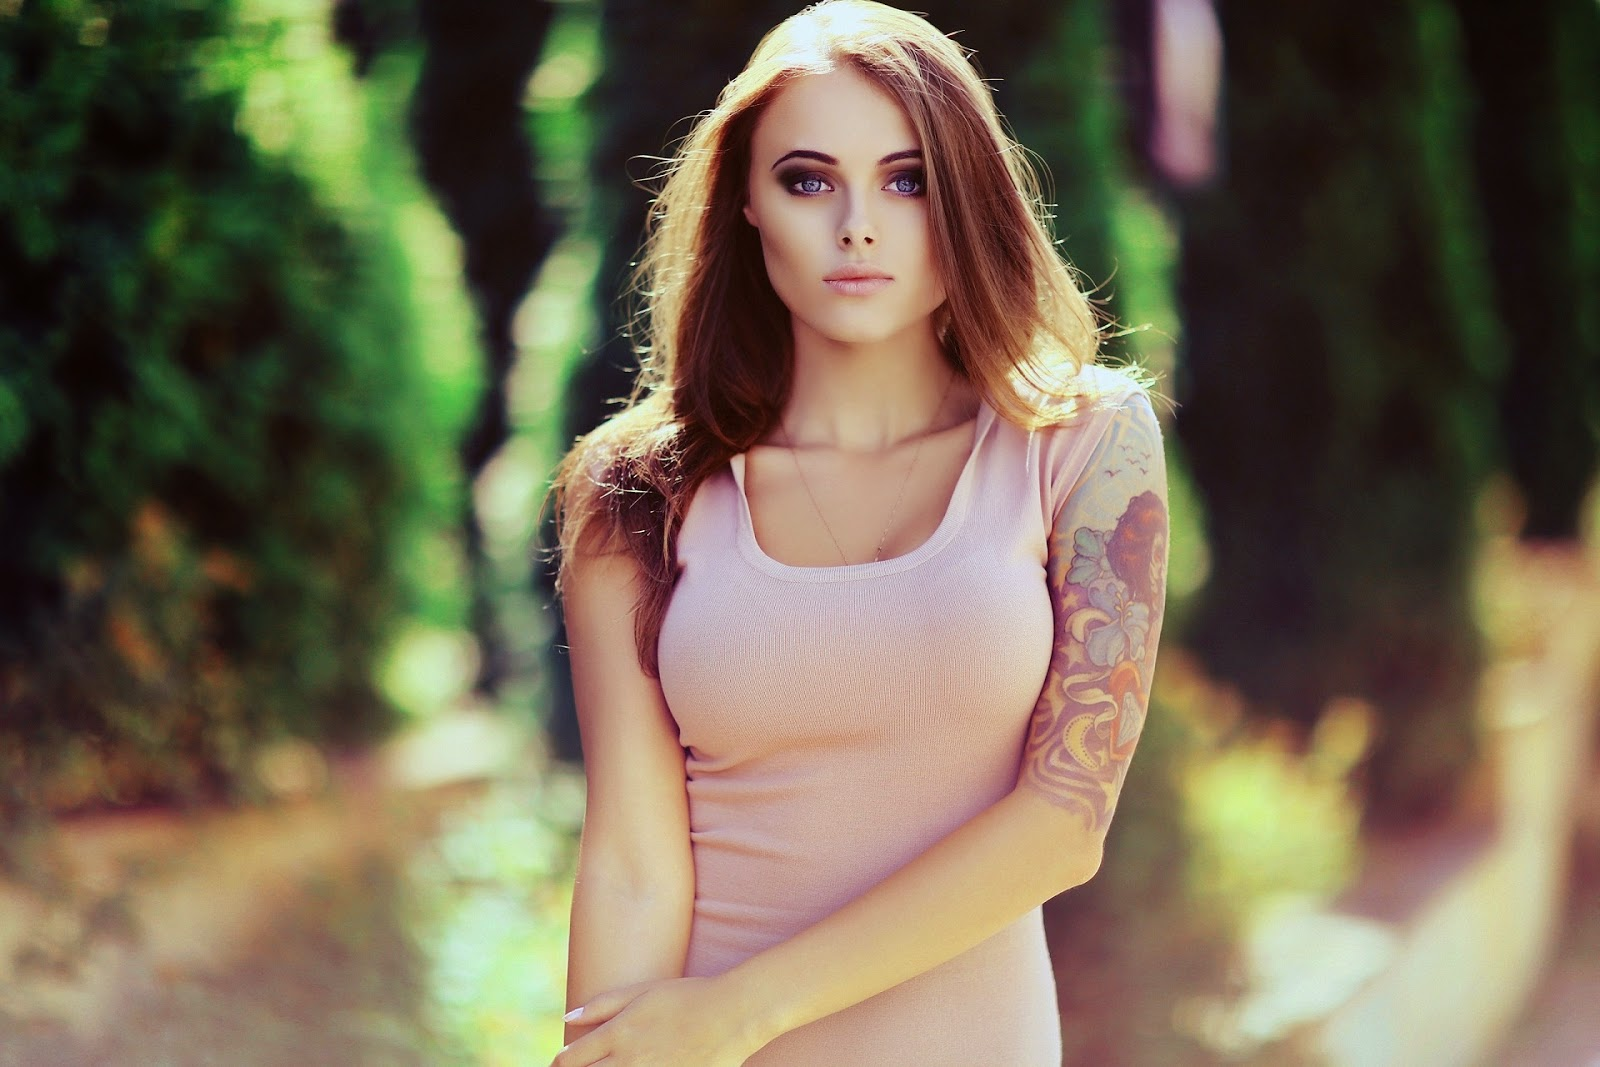 Lesbian elf seduction naked pics